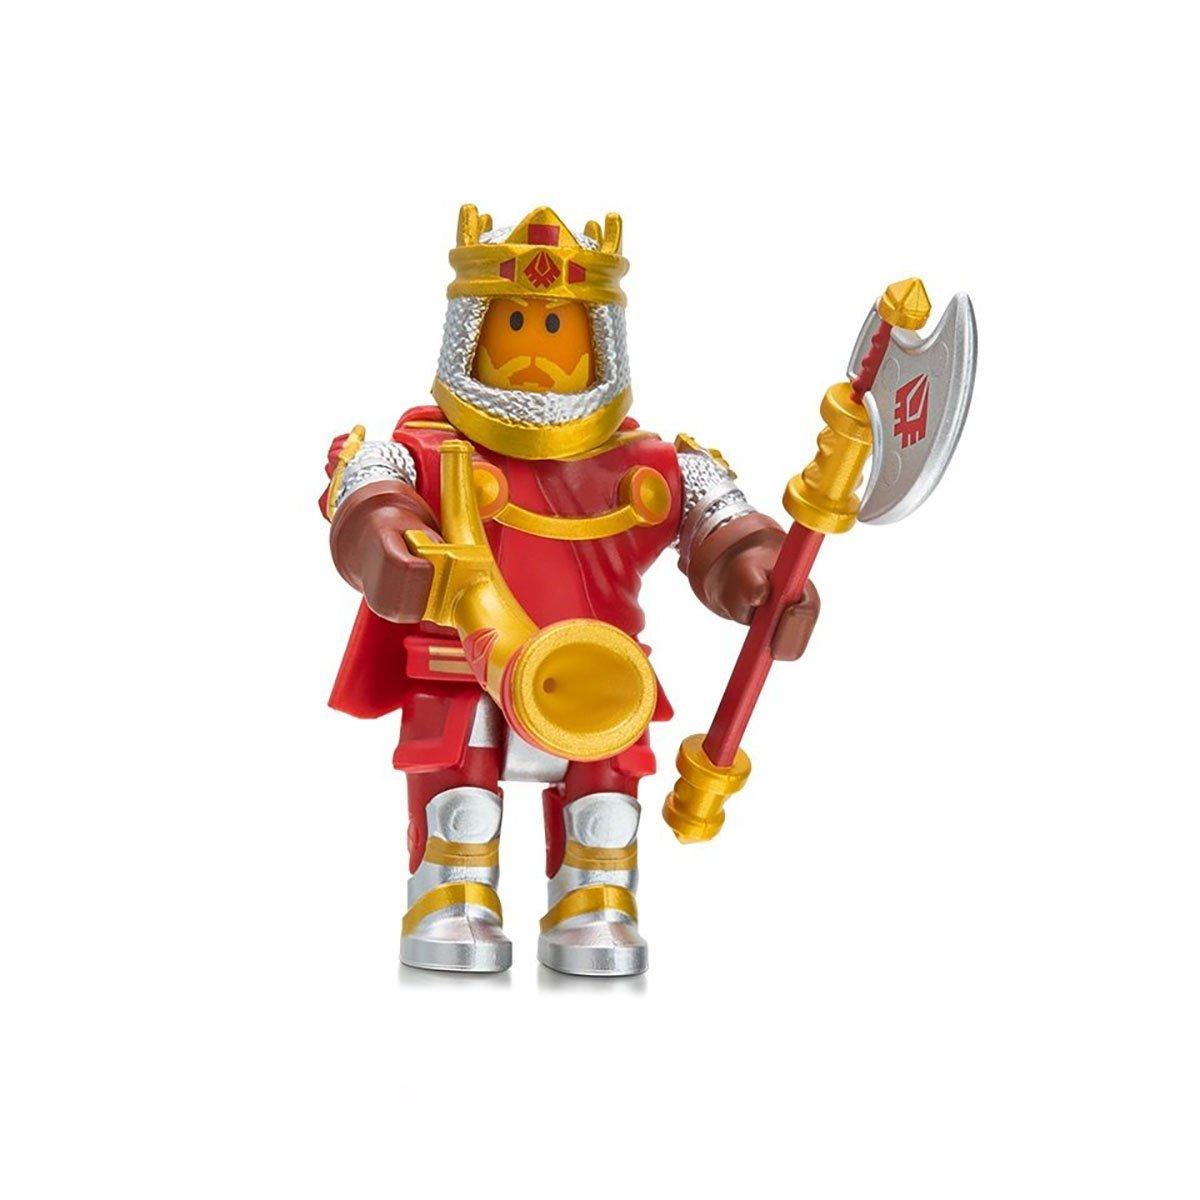 Figurina Roblox - Richard, Redcliff King (ROG0110)